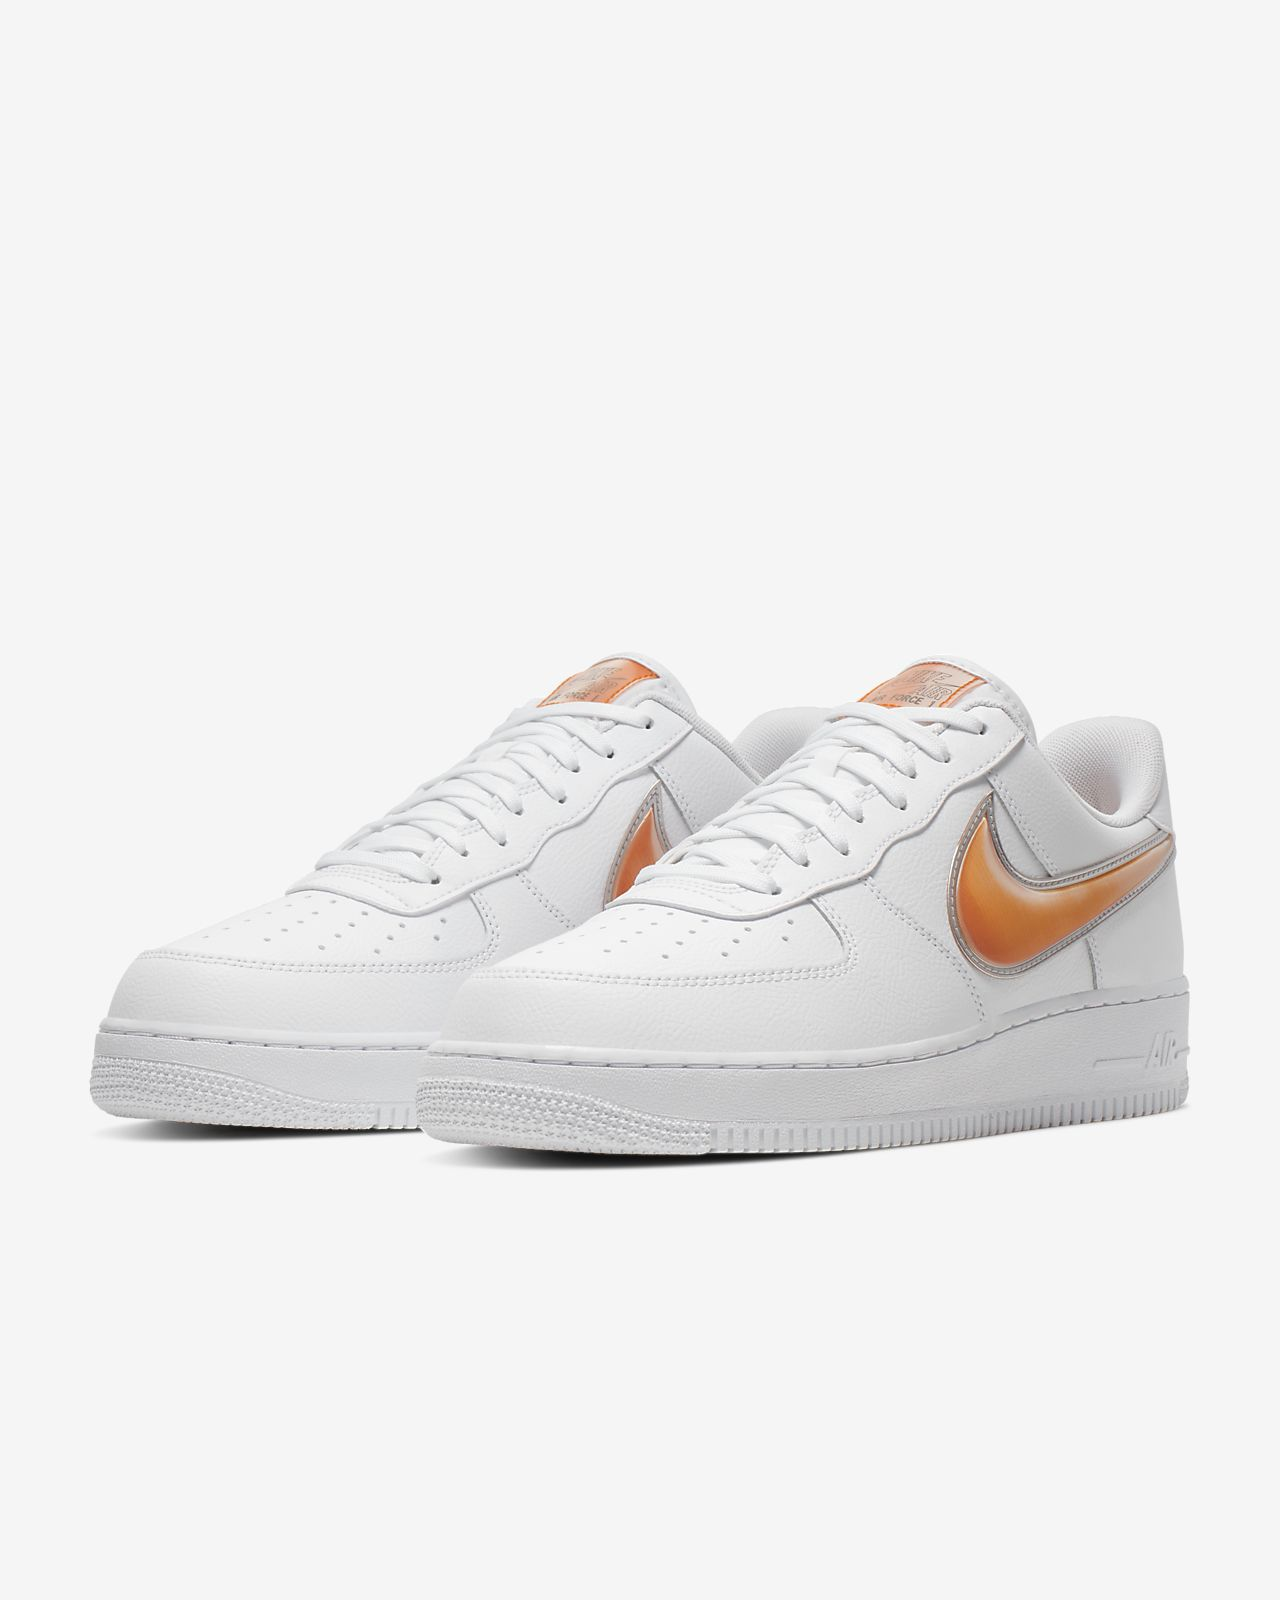 newest 1bb22 690eb ... Nike Air Force 1  07 LV8 3 Men s Shoe